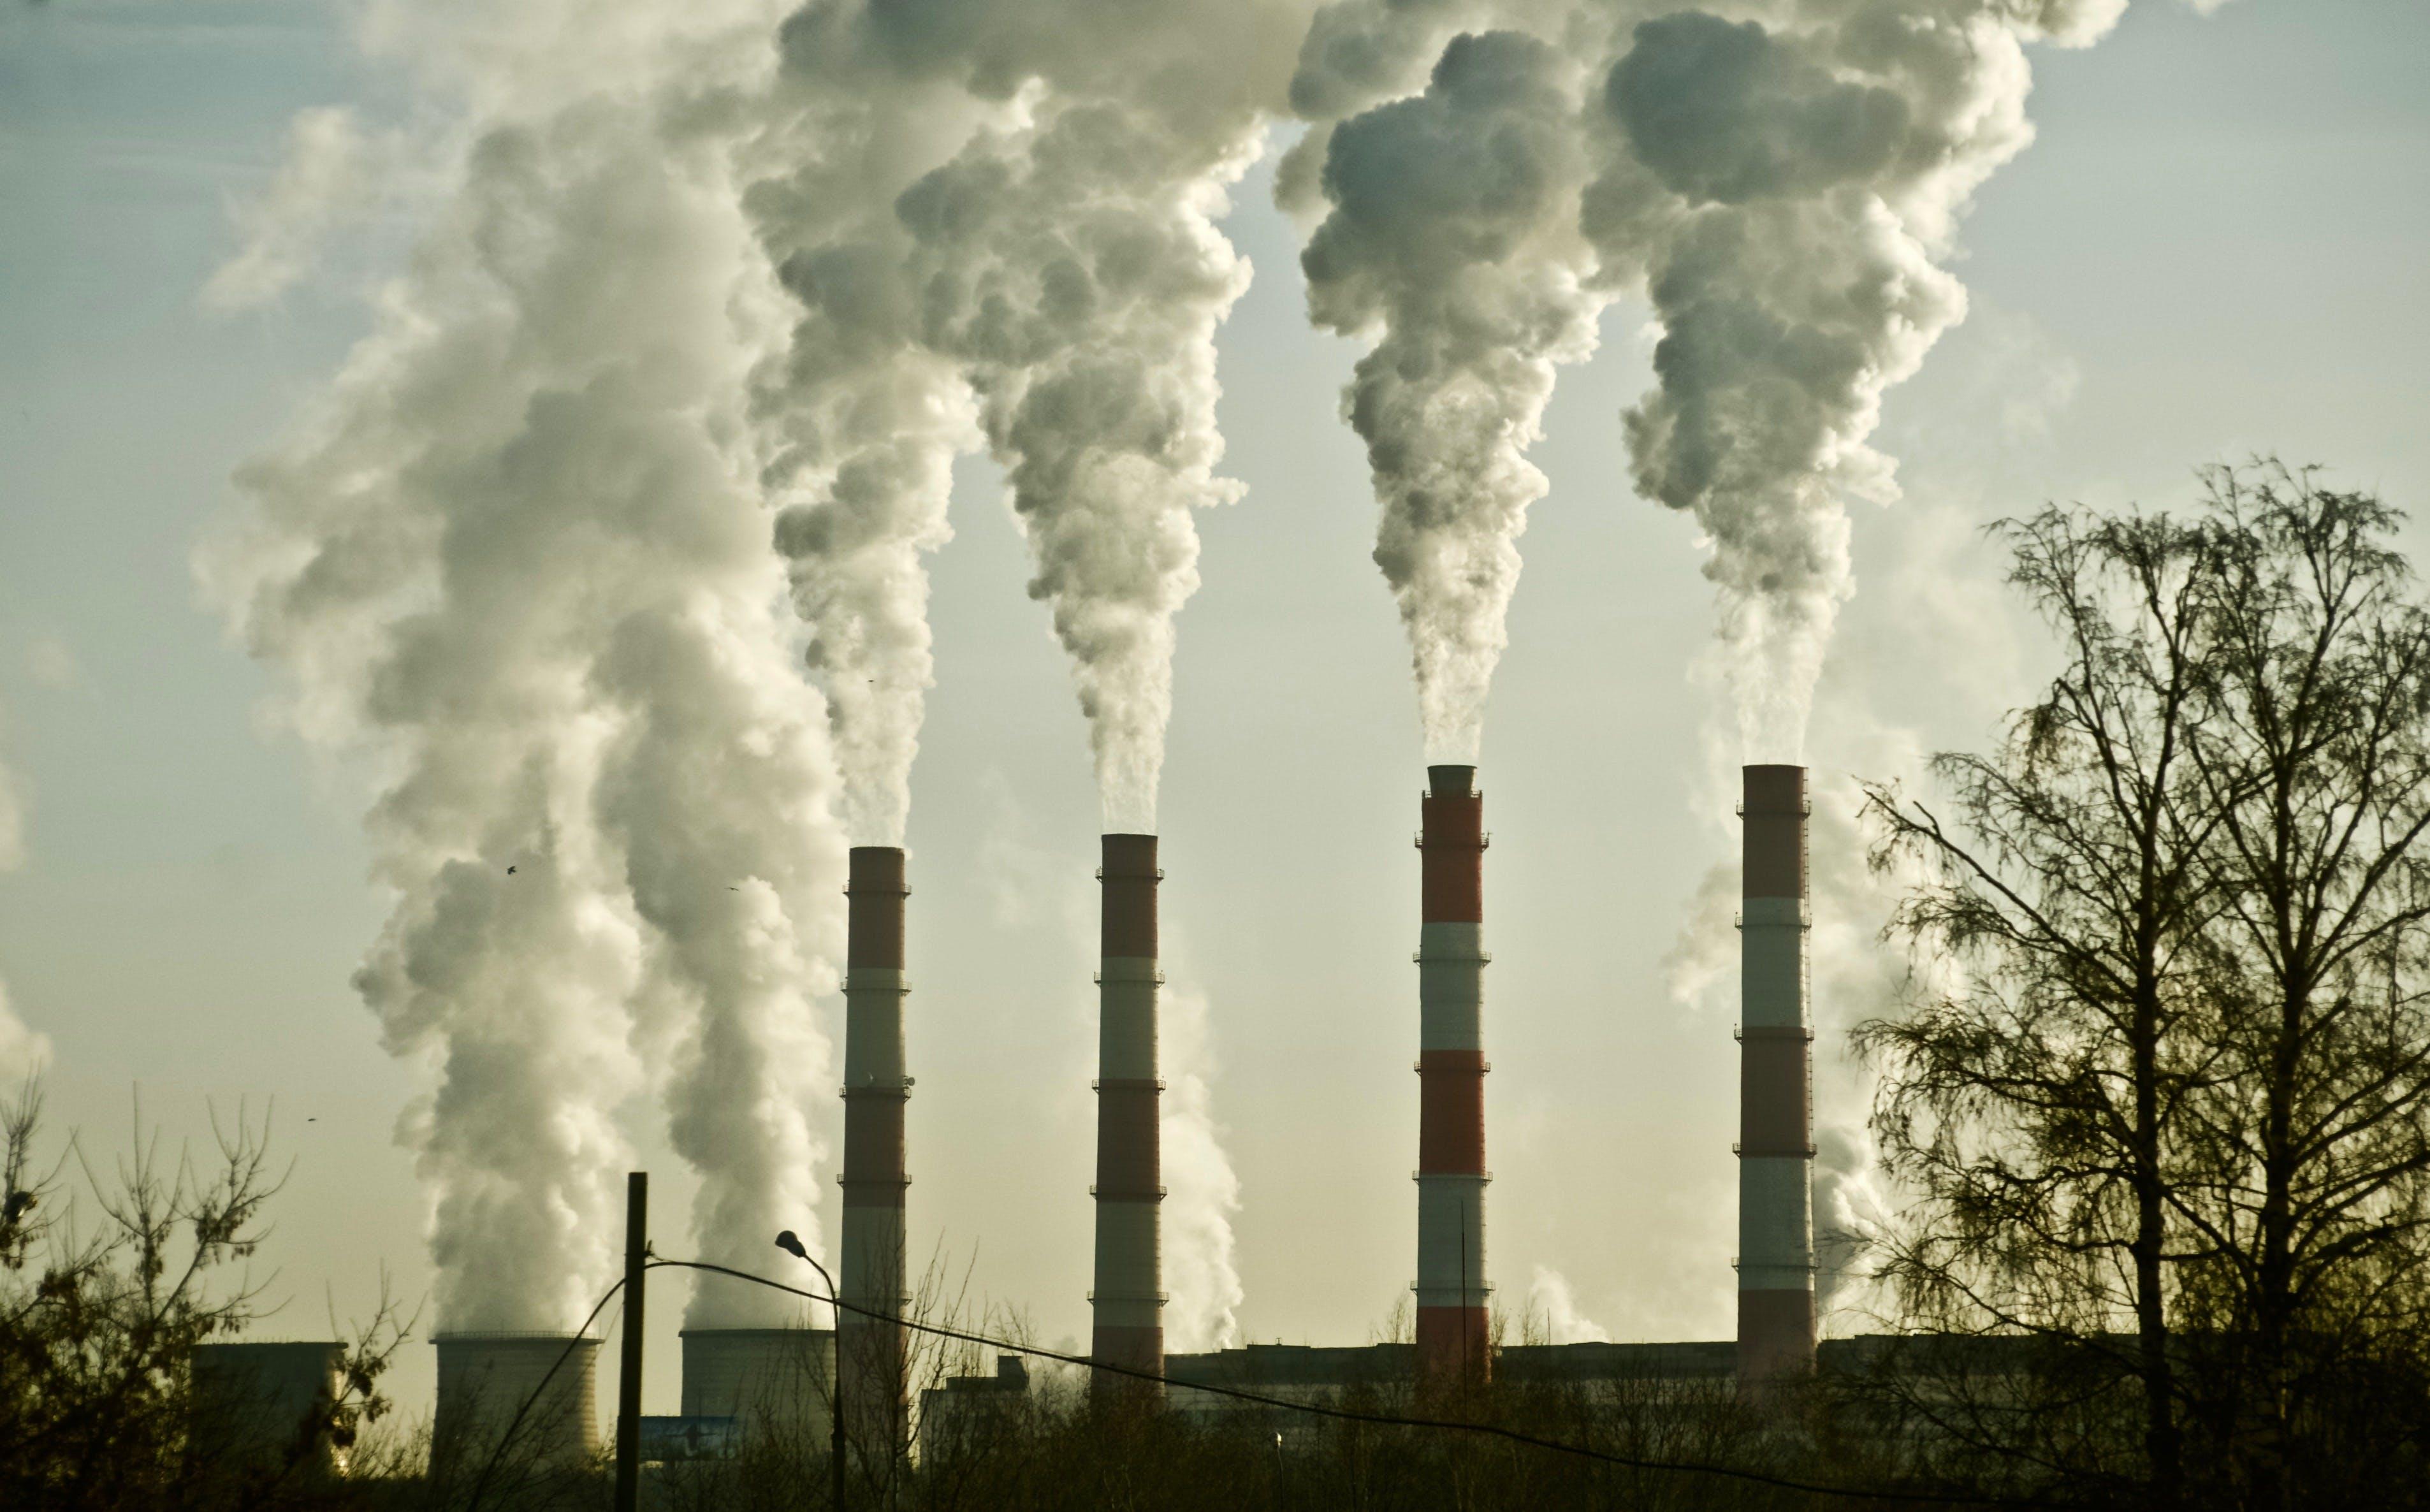 Free stock photo of chimney, chimneys, environment, environmental damage